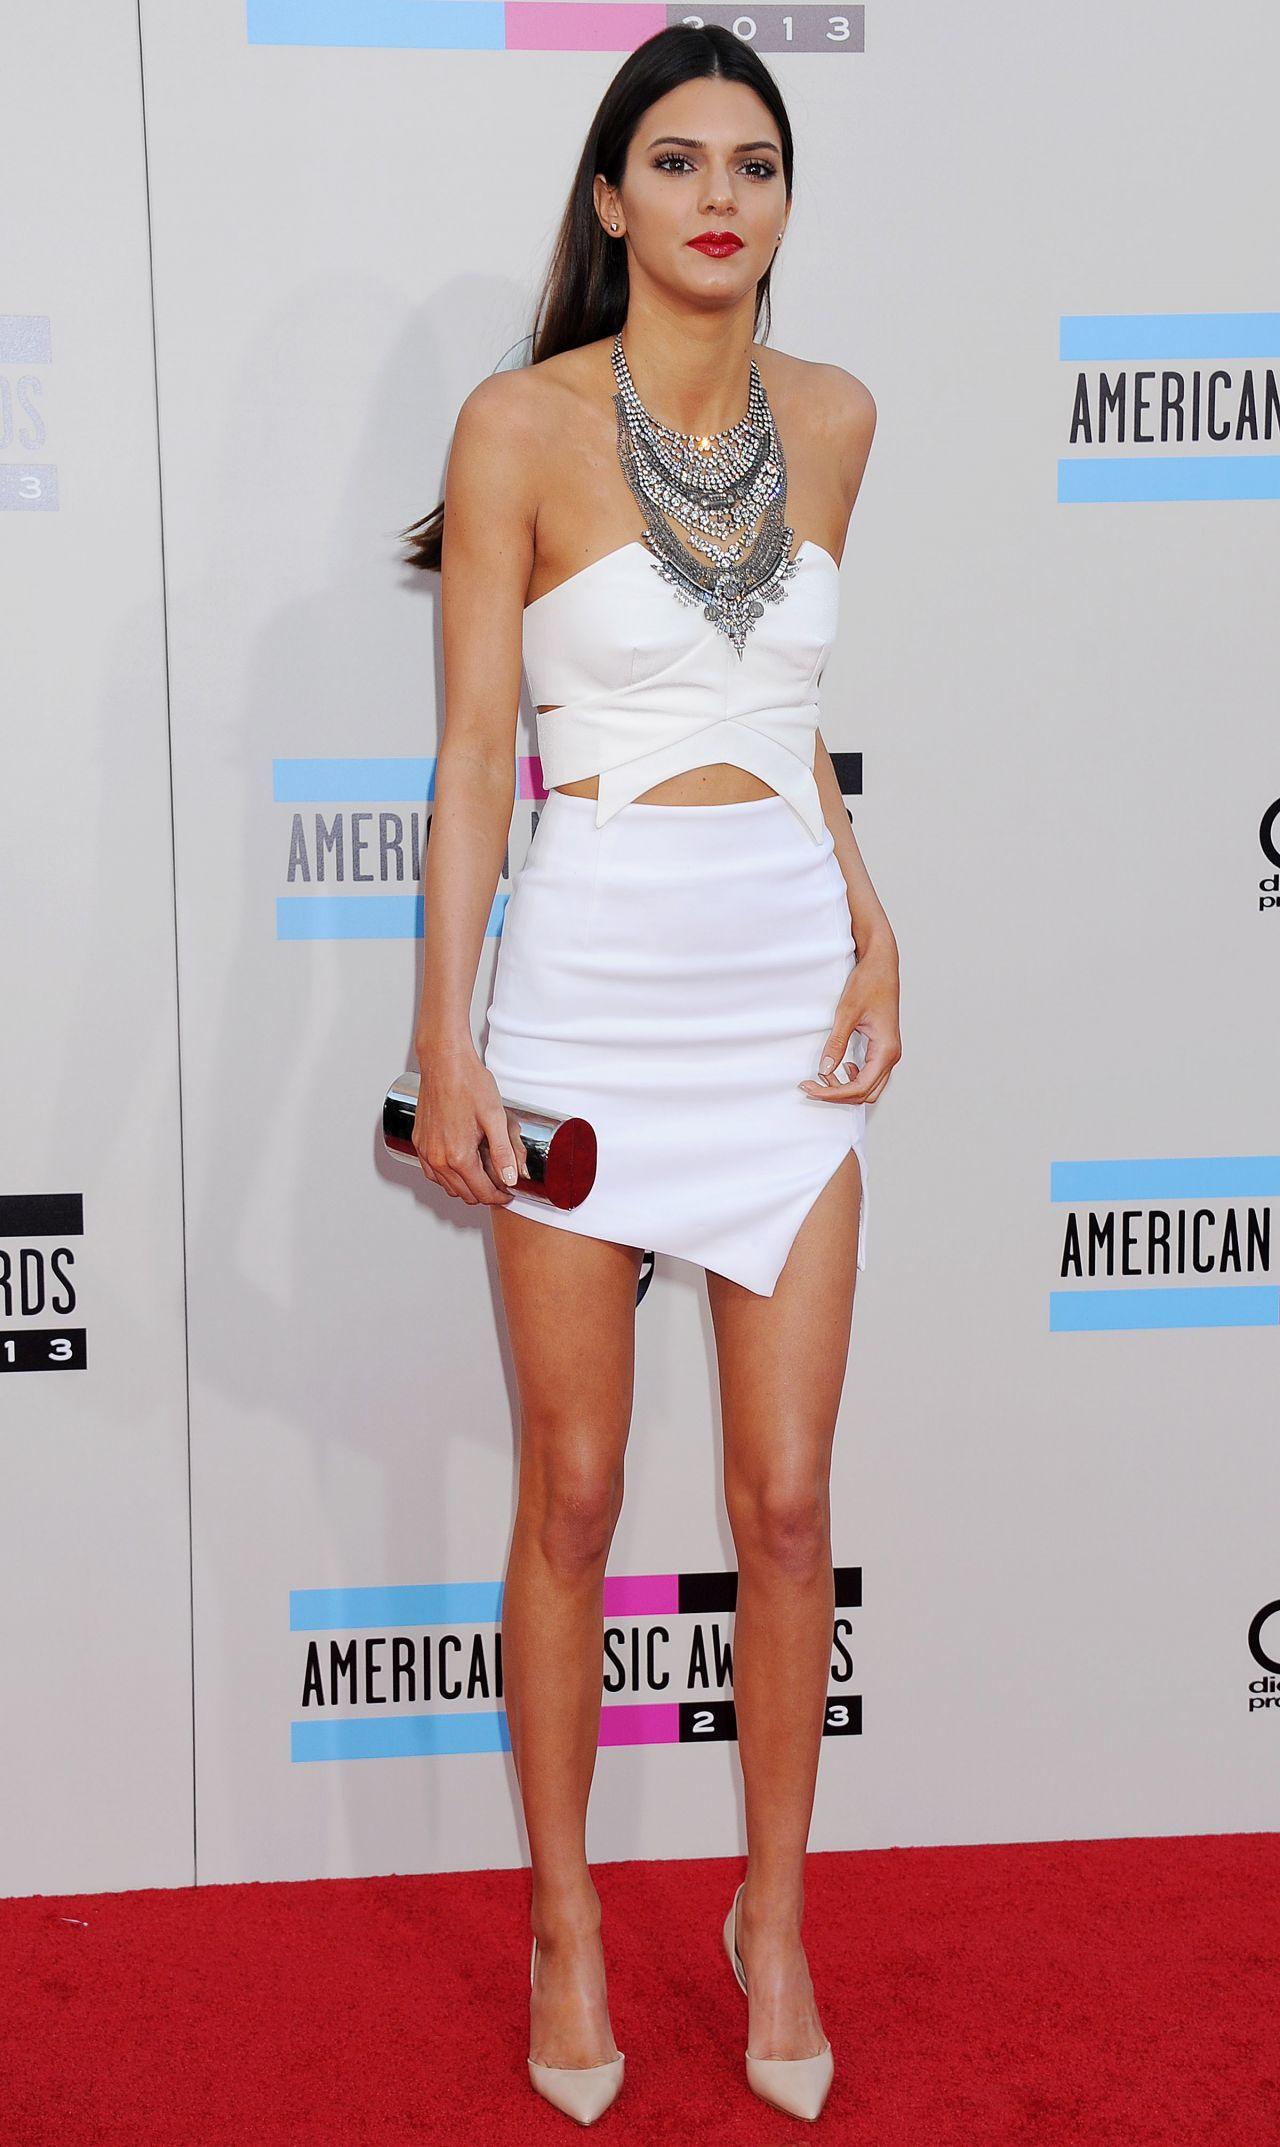 Kendall Jenner at 2013 American Music AwardsKendall Jenner 2013 Hair